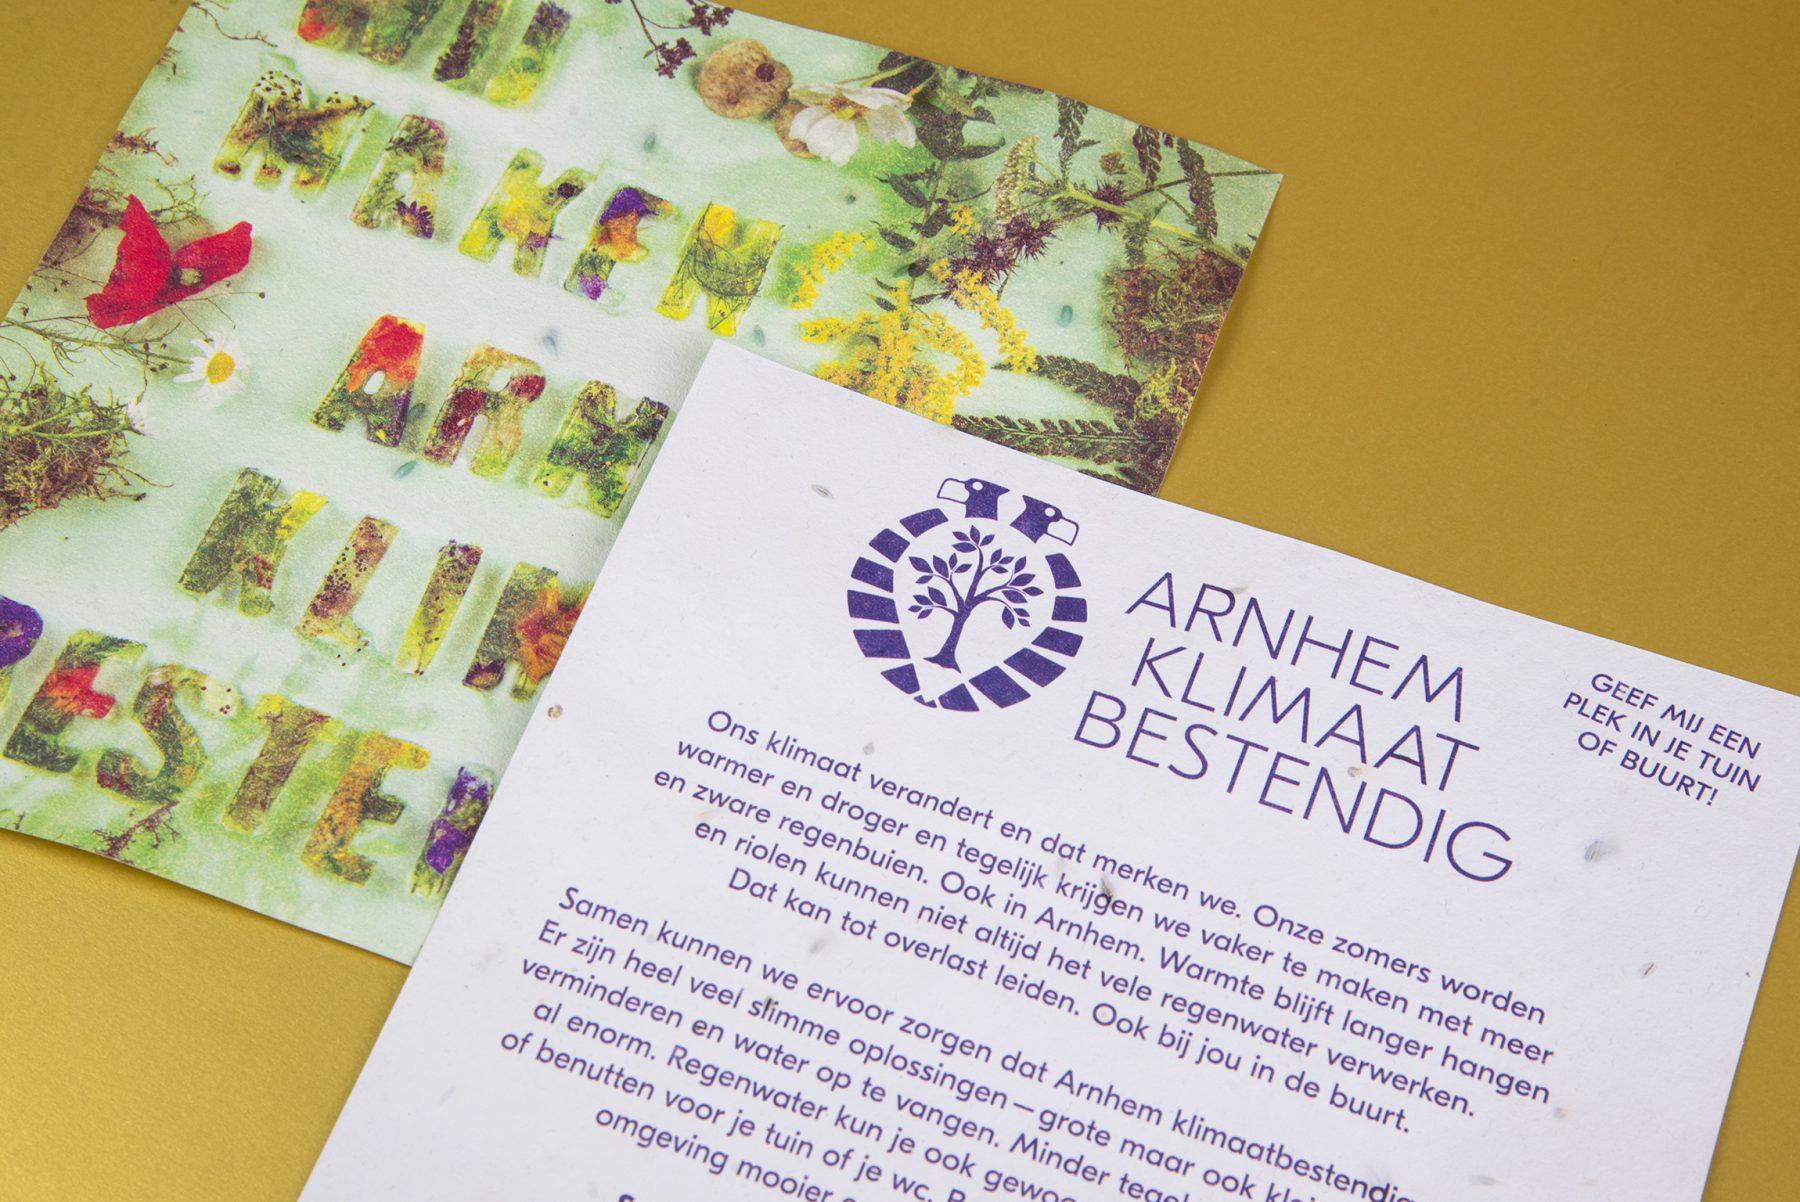 Arnhem Klimaatbestendig gemeente arnhem klimaat grafisch ontwerp bloempapier DDD natuur ijsletters bloempapier zaaipapier